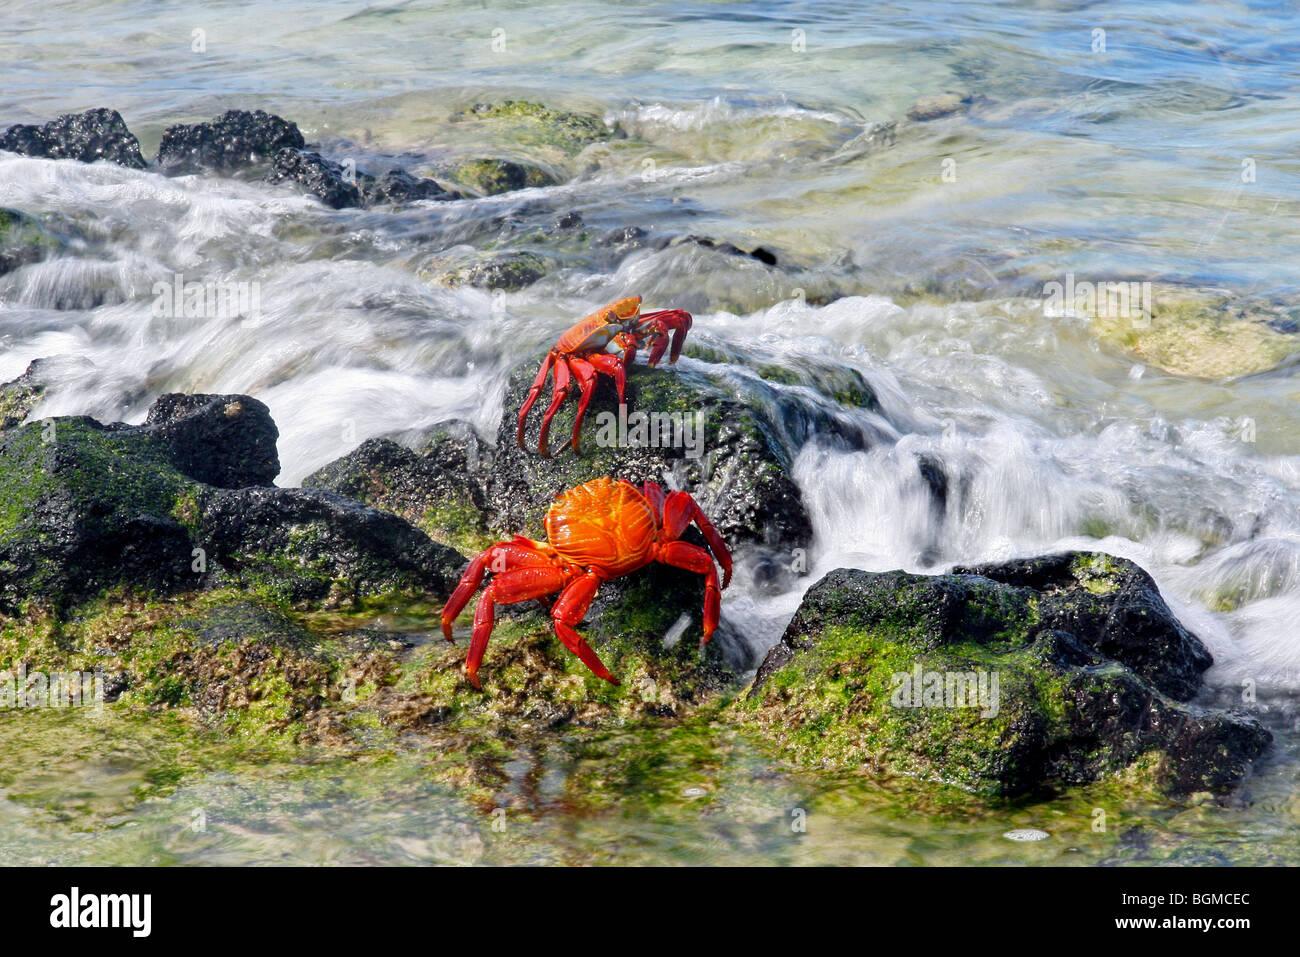 Sally lightfoot crabs / red rock crab / abuete negro (Grapsus grapsus), Las Bachas Bay on Santa Cruz island, Galápagos - Stock Image